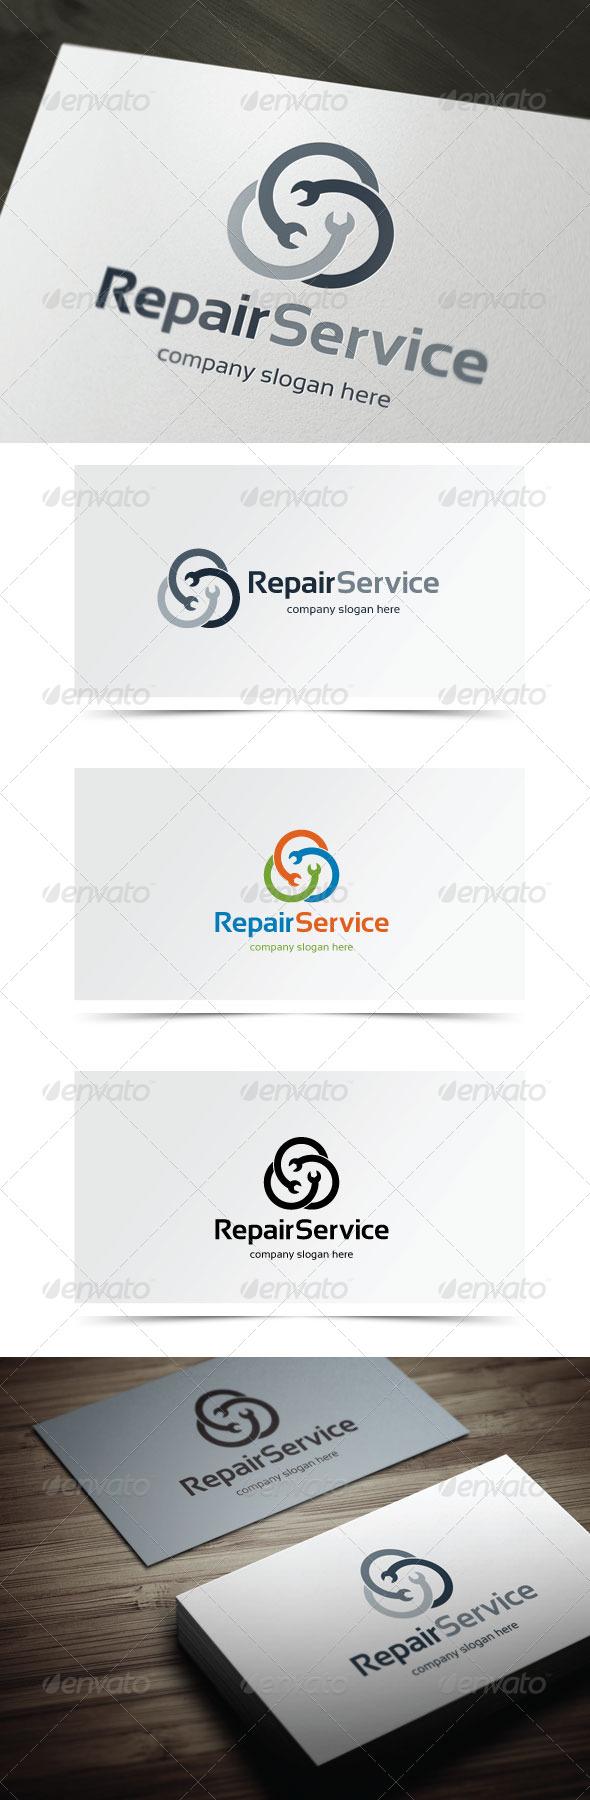 GraphicRiver Repair Service 6059161